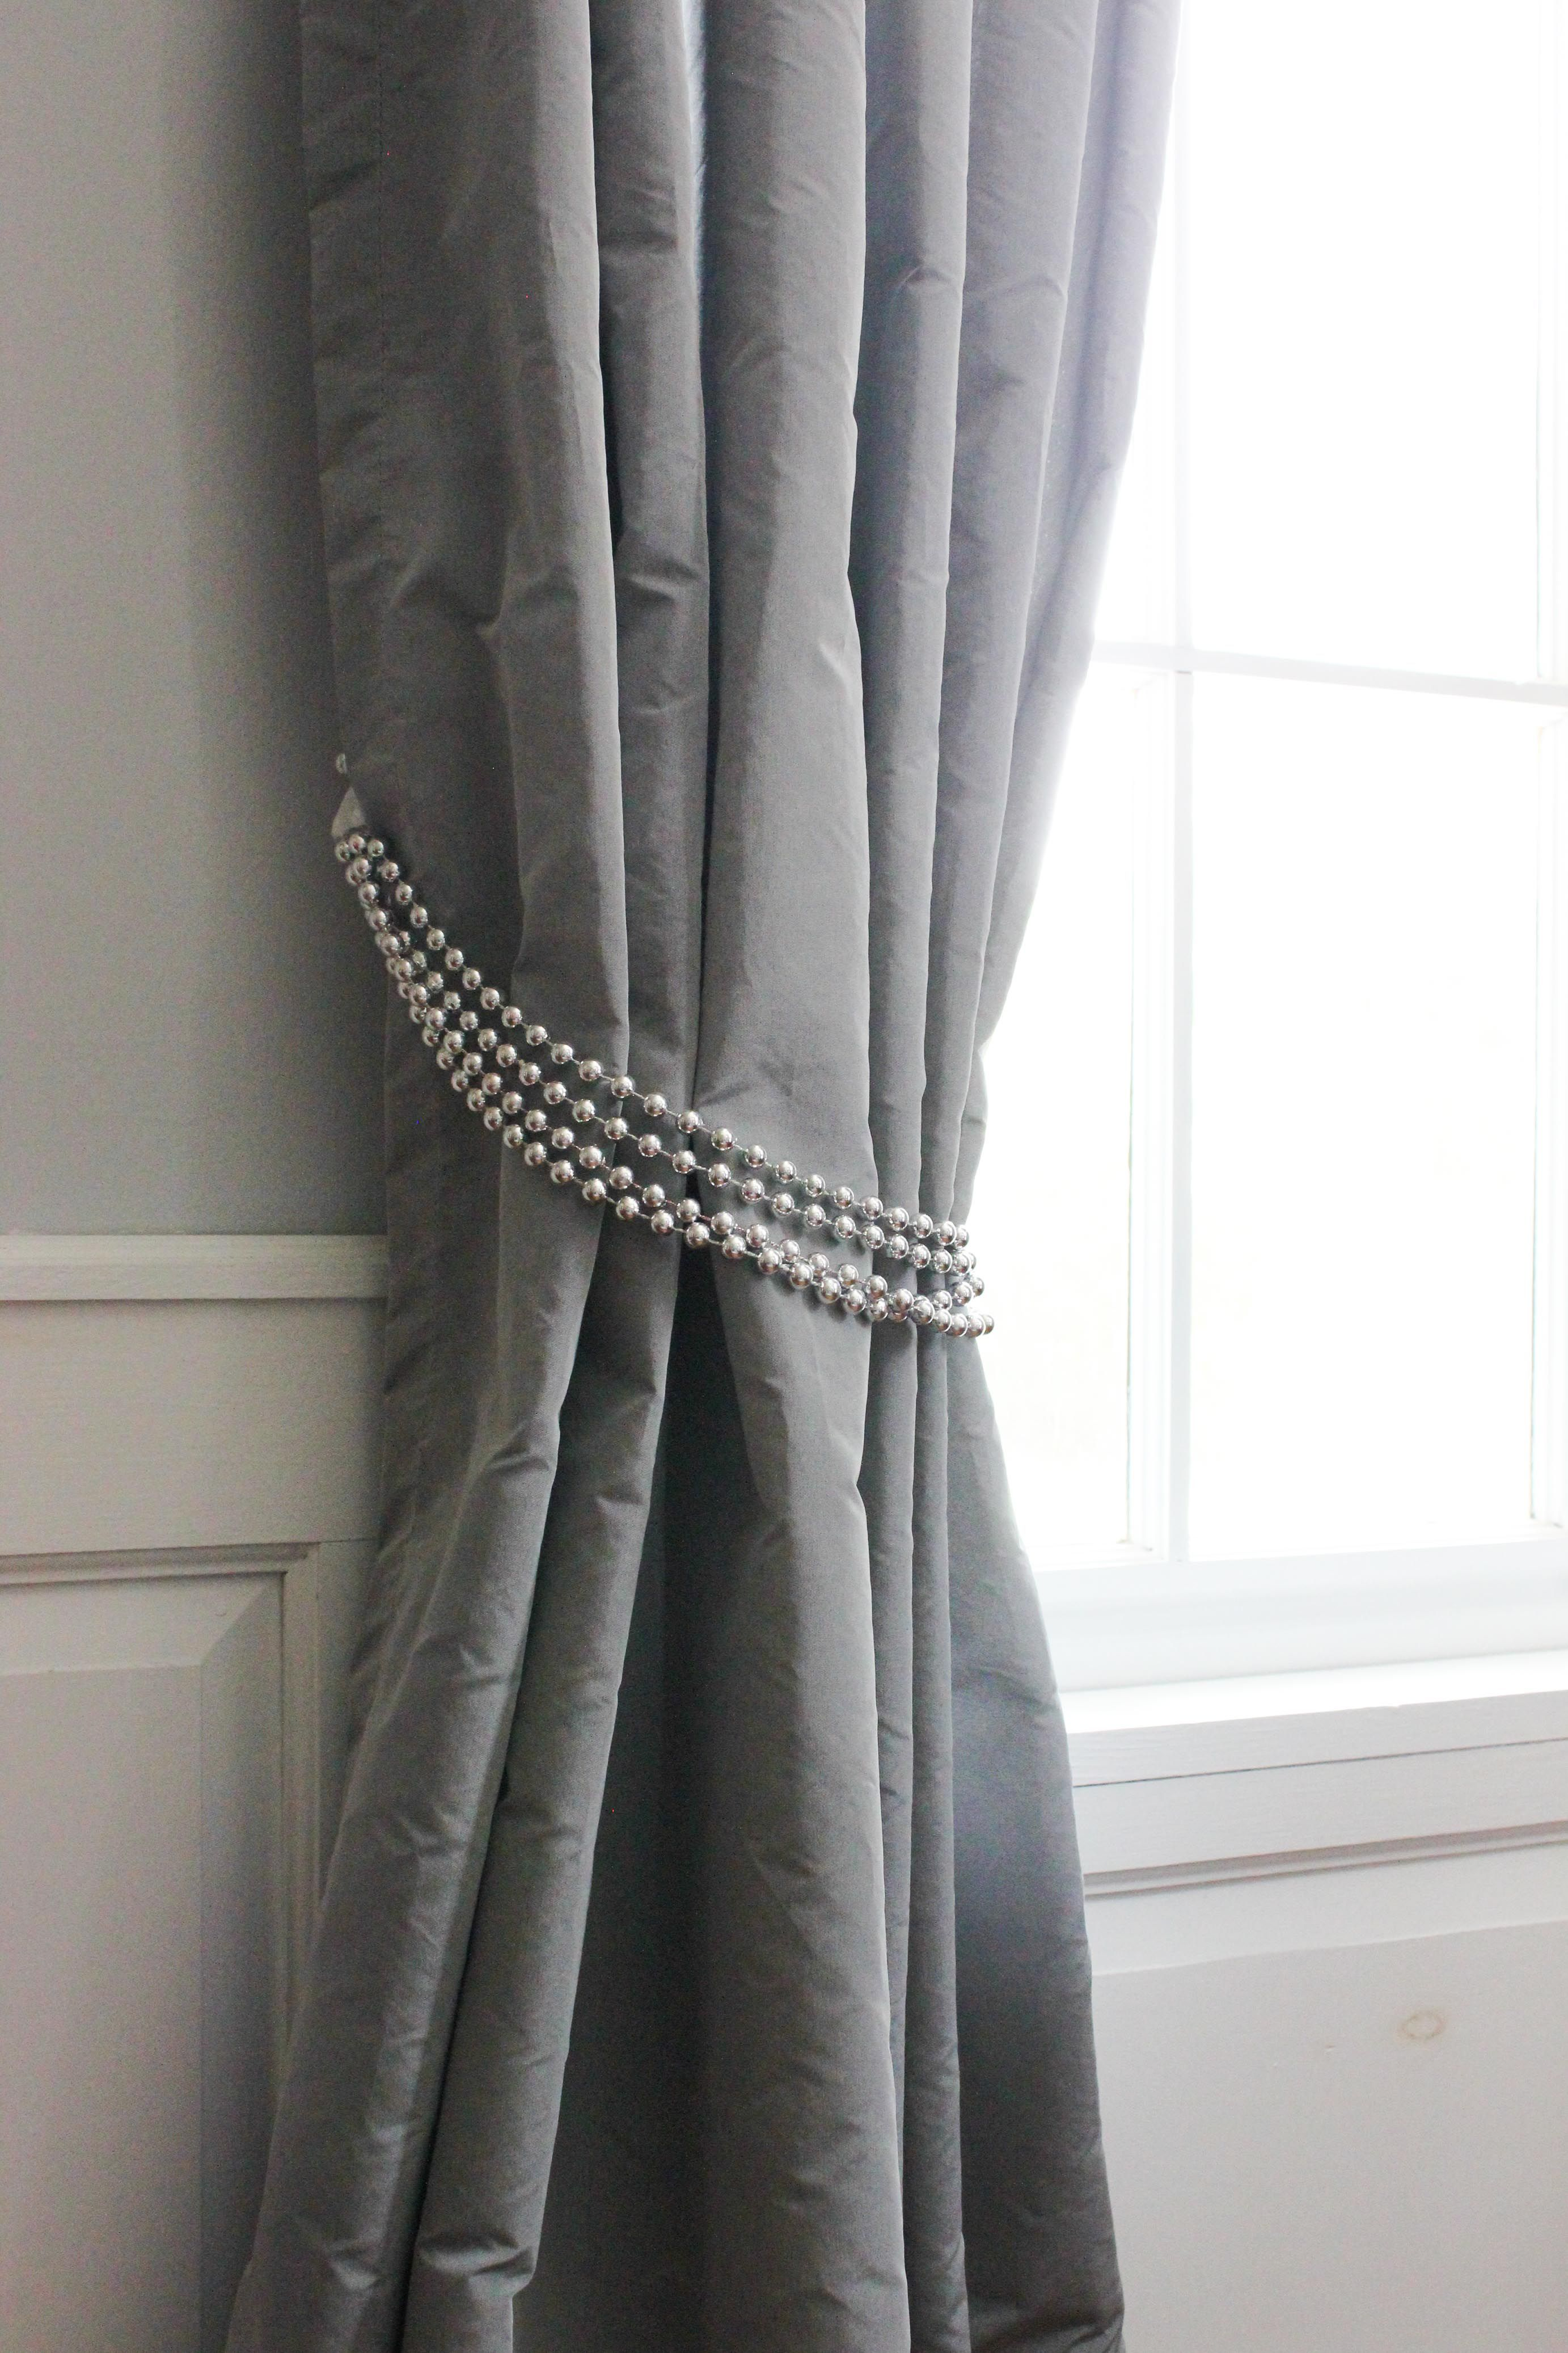 Diy Decorative Curtain Tie Backs Shower Curtain Decor Curtain